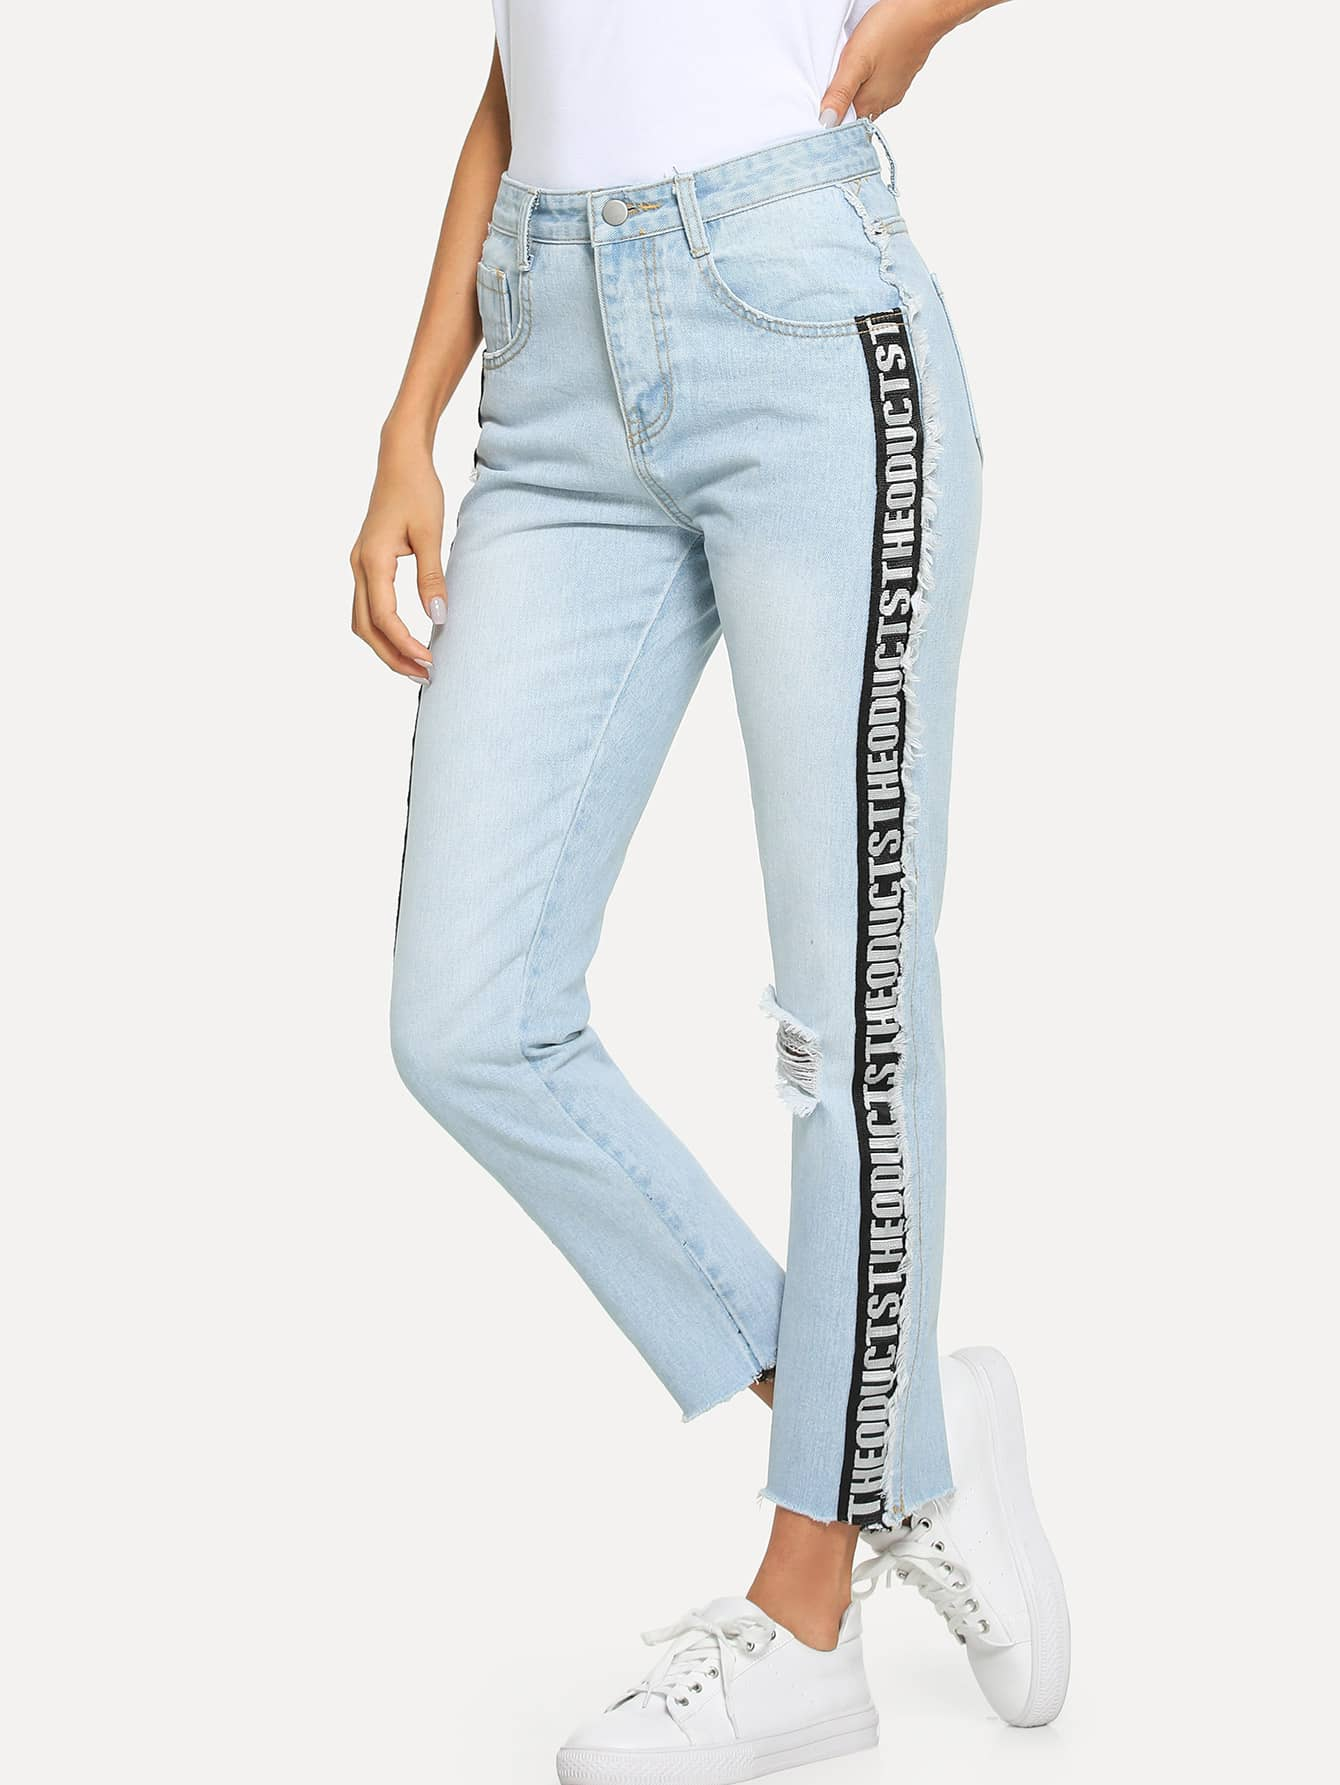 Letter Tape Side Raw Hem Jeans men letter embroidery side jeans